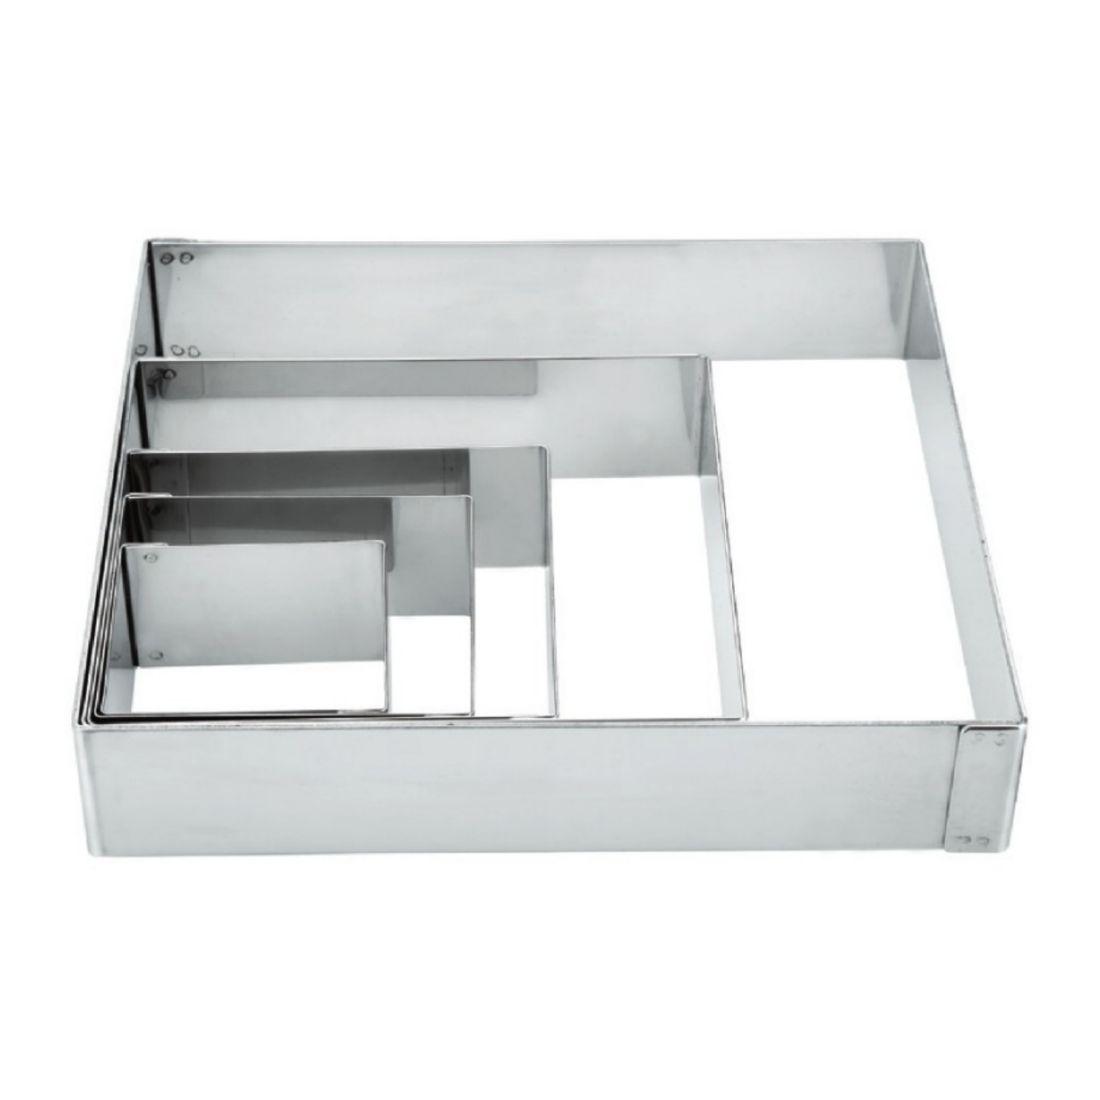 Forma čtvercová 160 x 160 mm